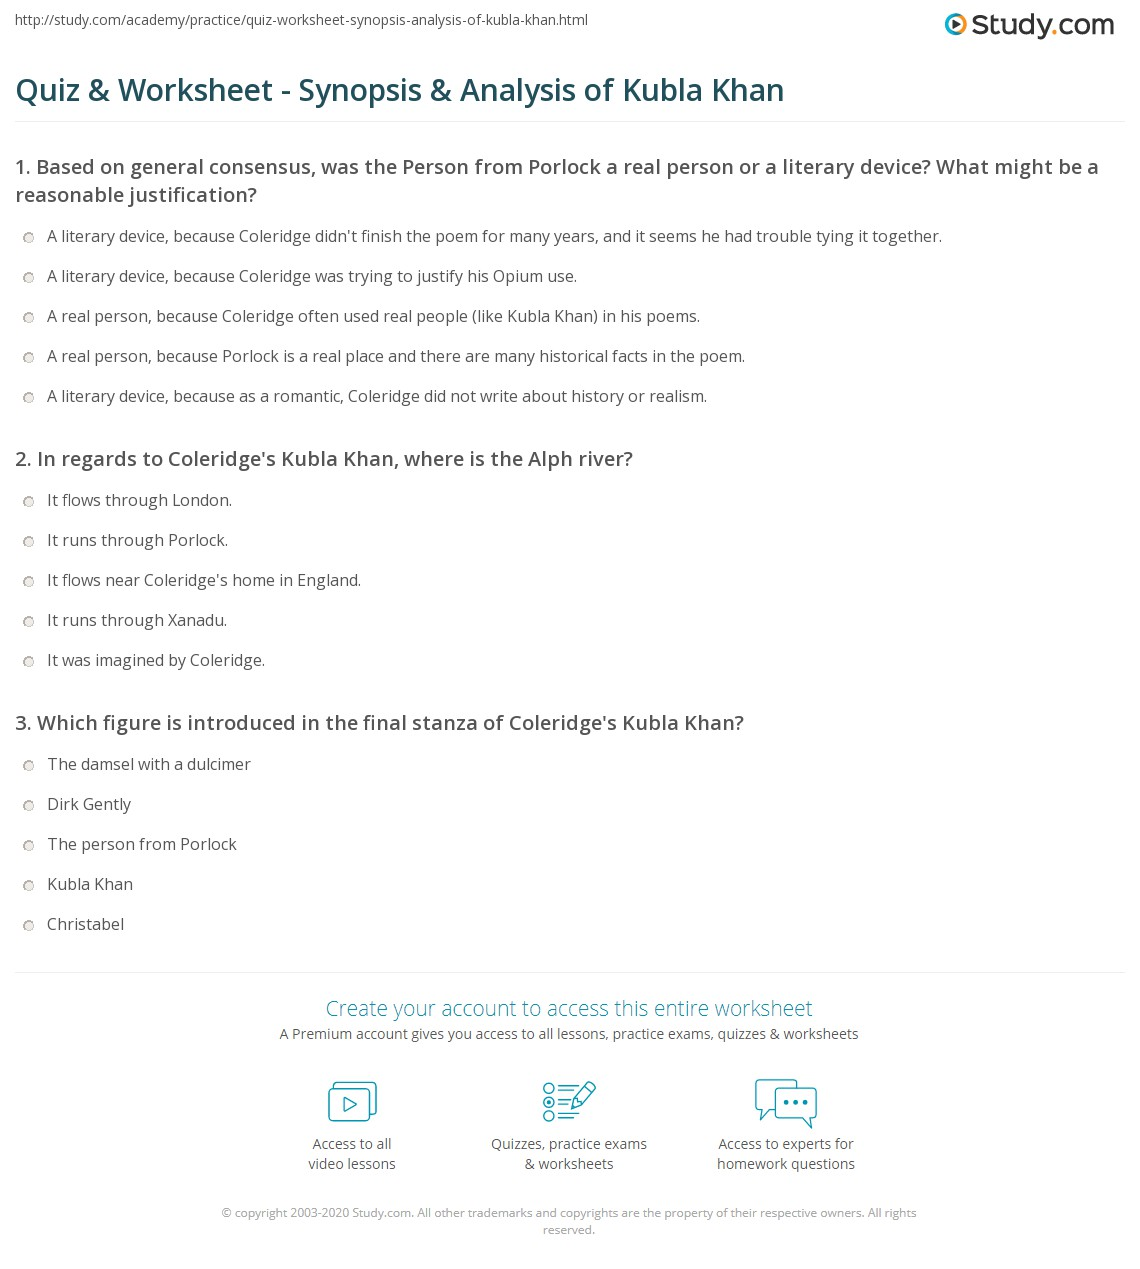 quiz worksheet synopsis analysis of kubla khan com print kubla khan by coleridge analysis and summary worksheet